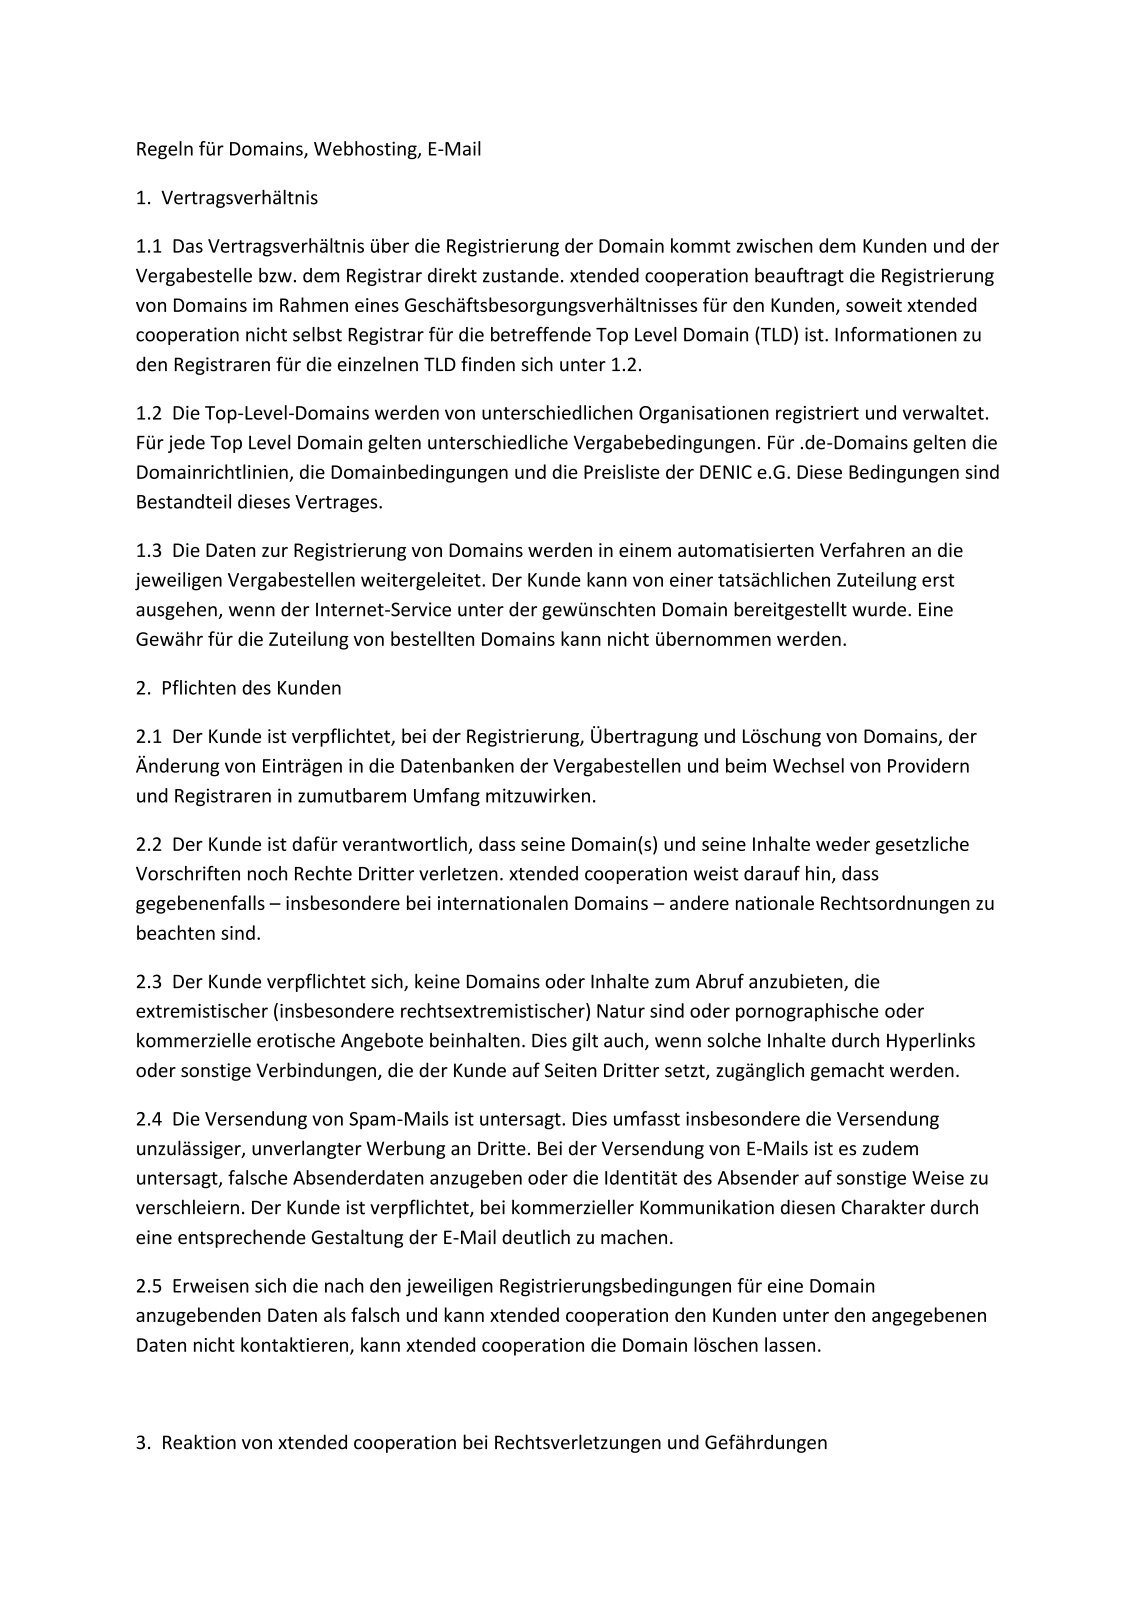 Charmant Bandscheibenvorfall Erholzeit Rahmen Fotos - Rahmen Ideen ...